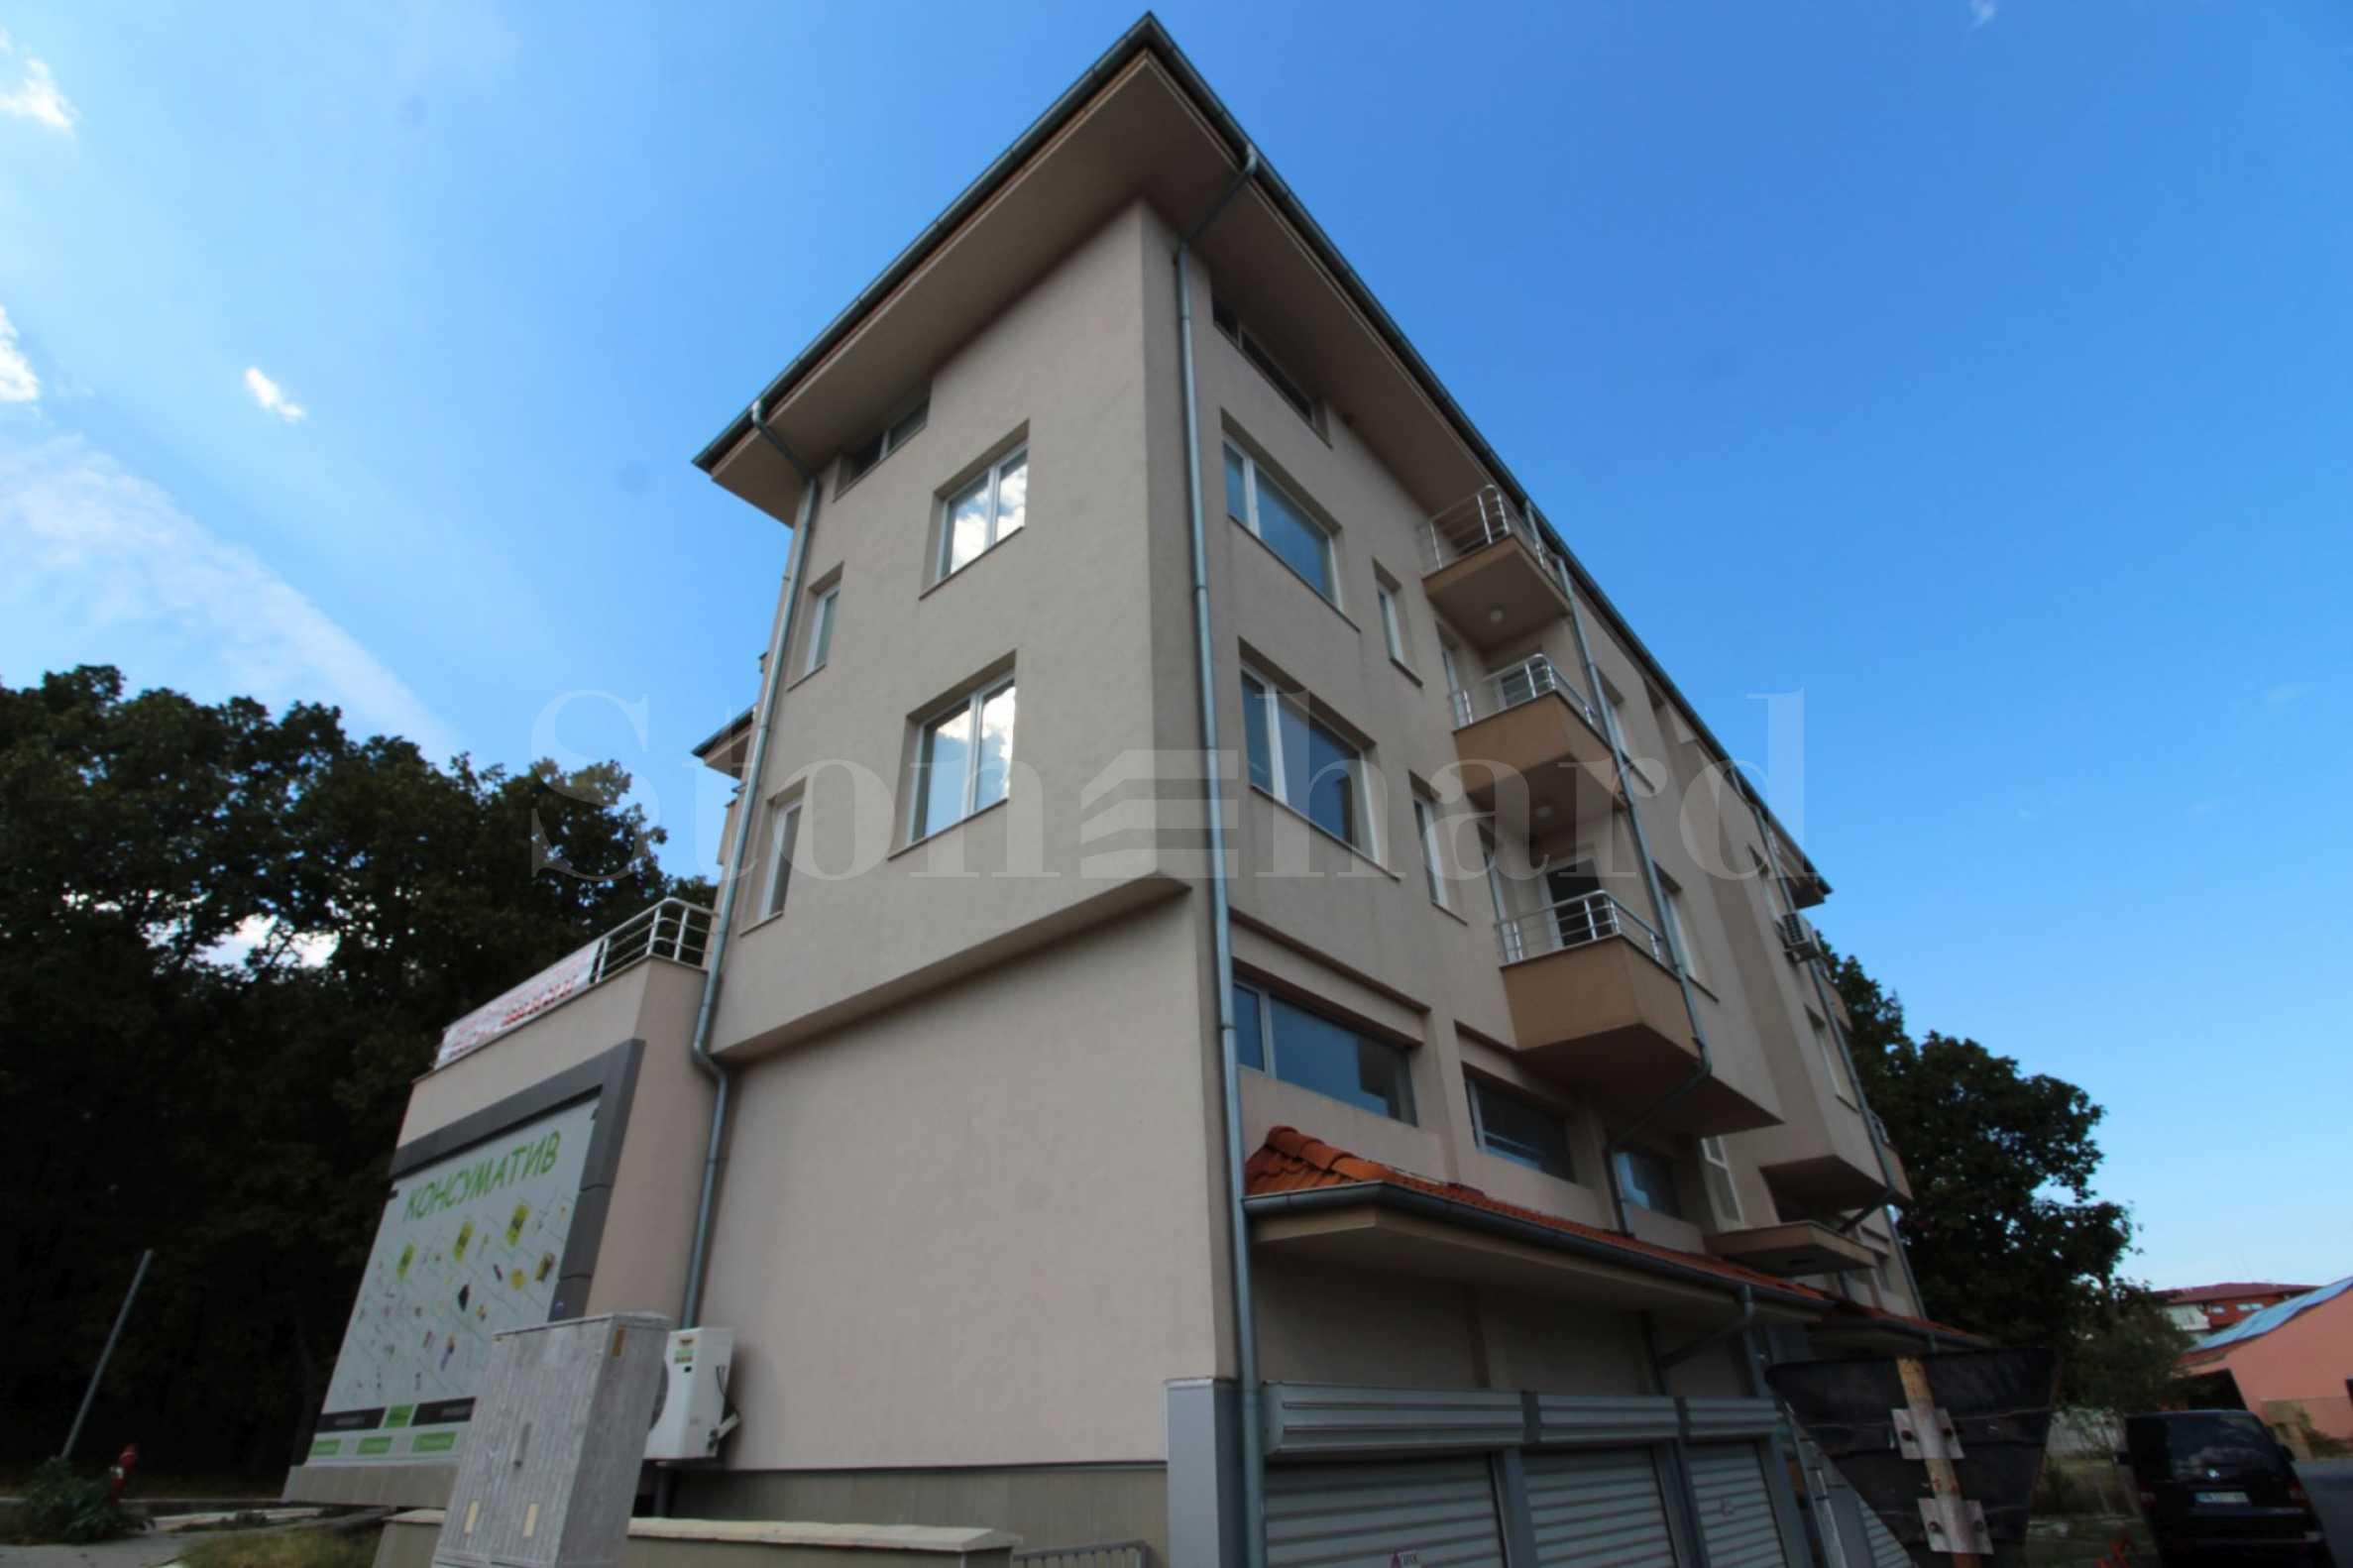 Turnkey apartments near Atliman beach2 - Stonehard